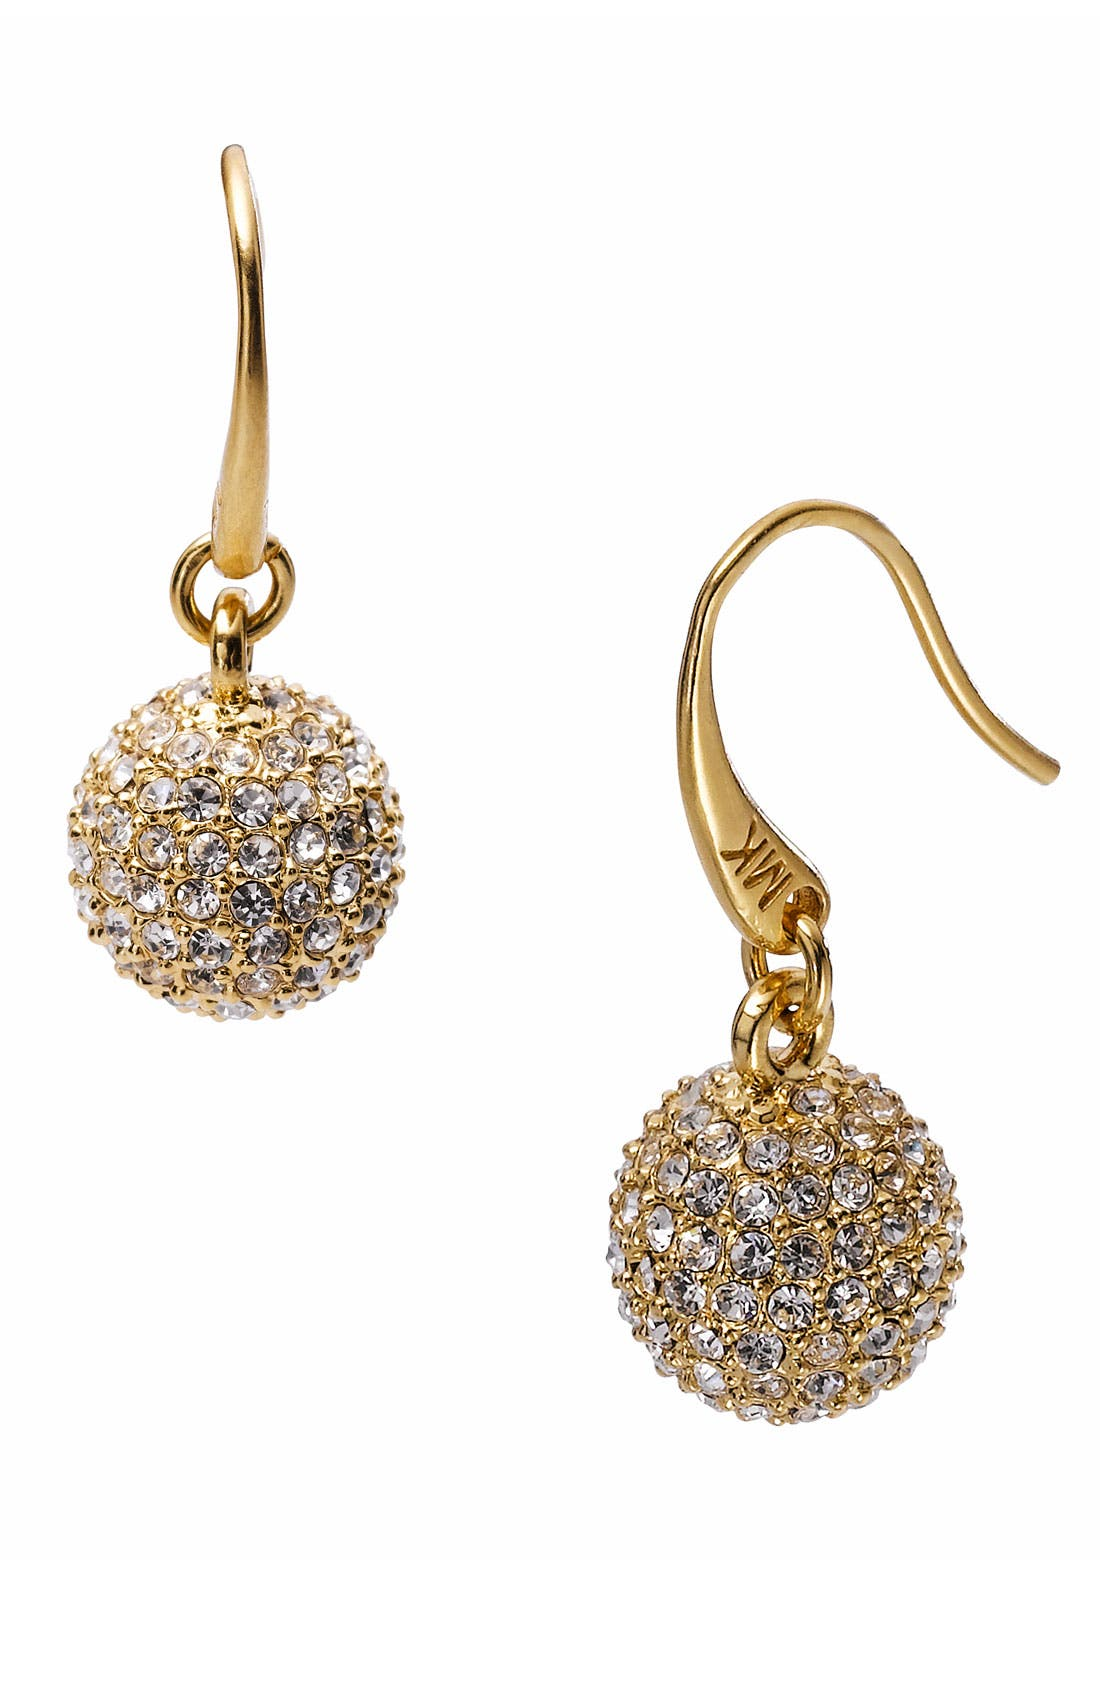 Alternate Image 1 Selected - Michael Kors 'Spring Sparkle' Pavé Ball Drop Earrings